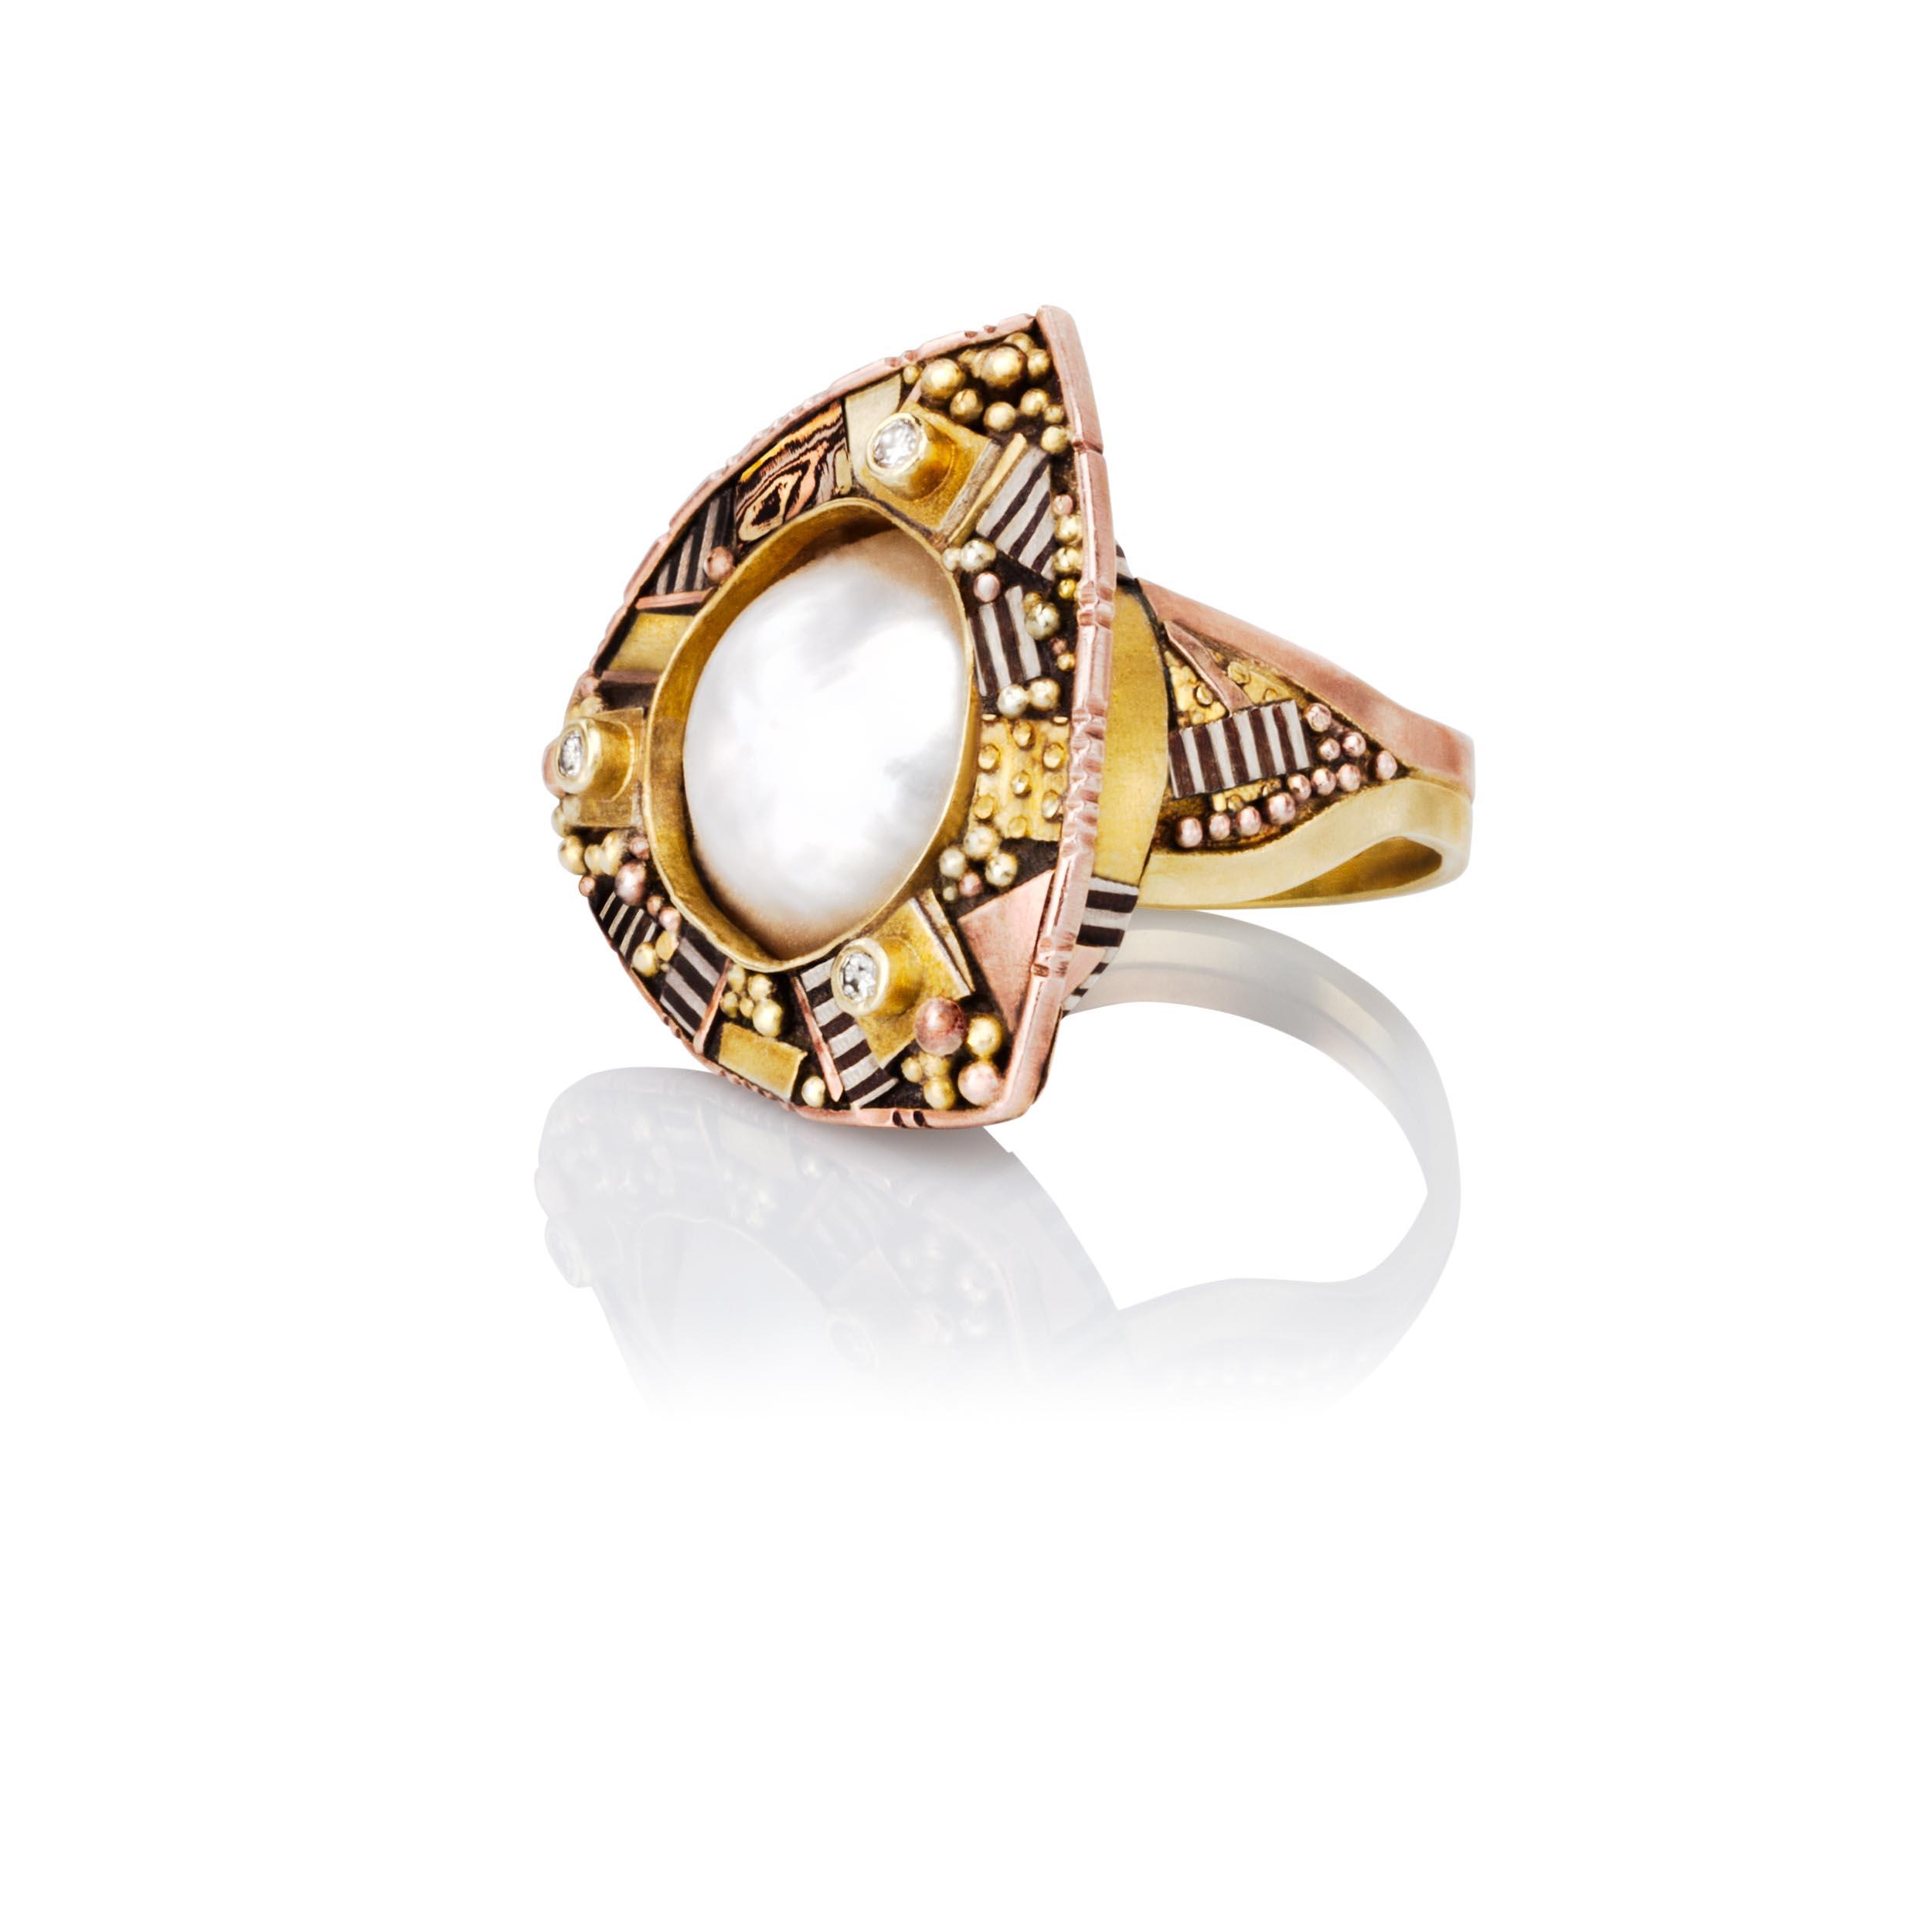 Client: Lynda Bahr Jewelry